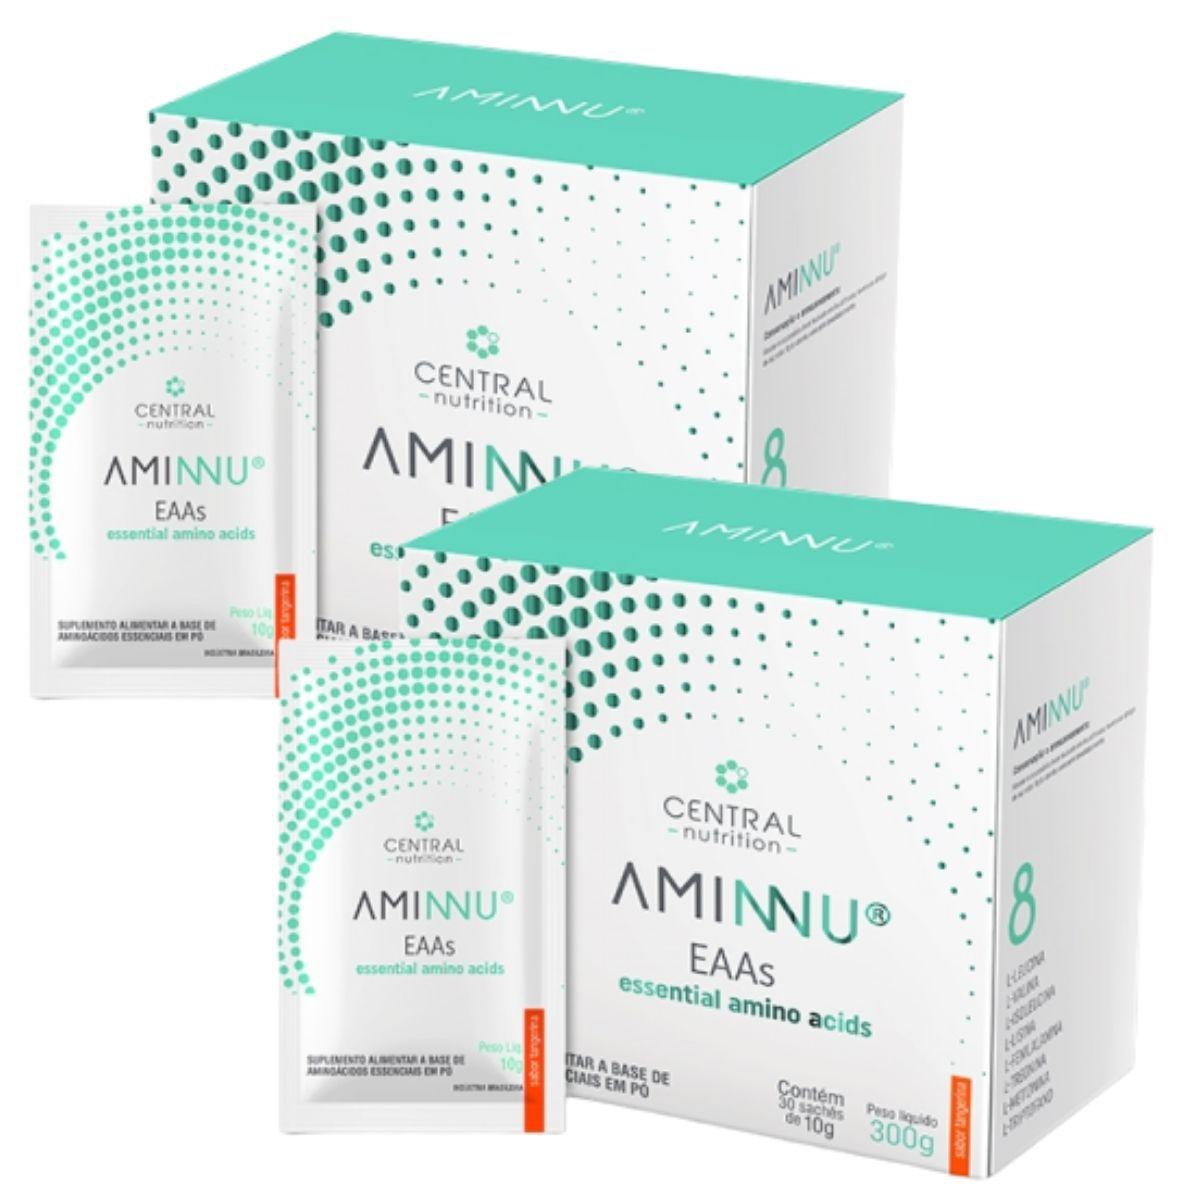 Kit 2 Aminnu Tangerina 10G 30 Sachês EAAs - A Base De Aminoácidos Essenciais - Central Nutrition